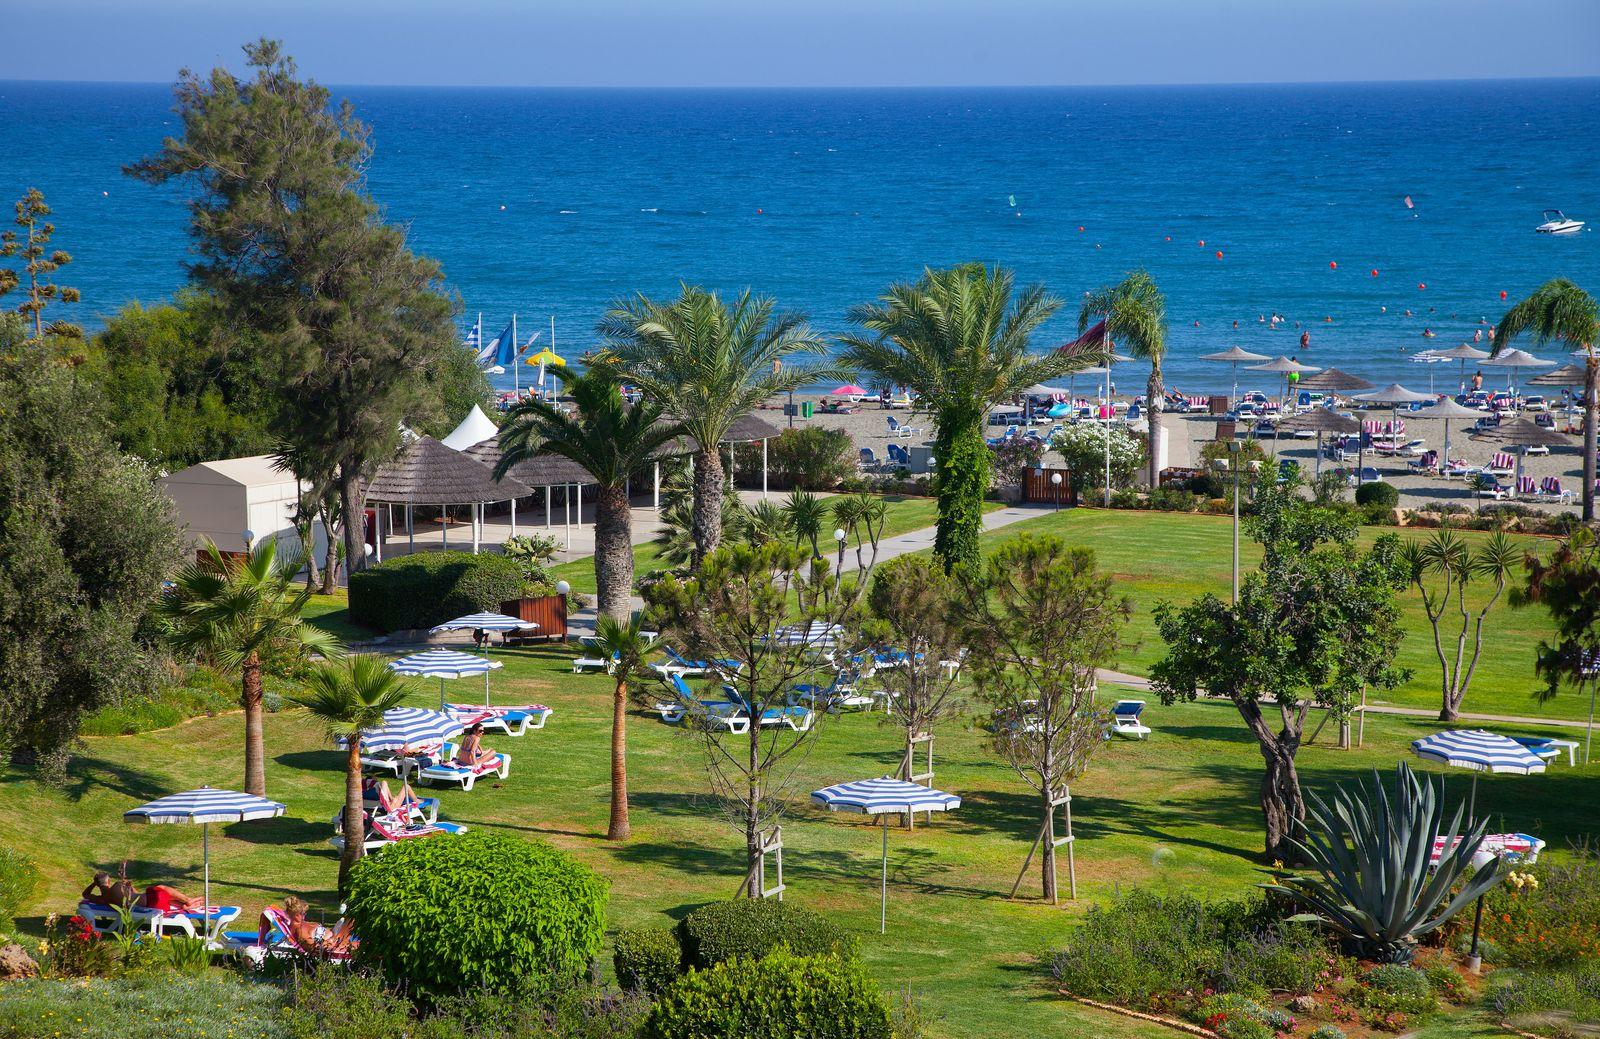 CYPR - LATO 2021: St. Raphael Resort*****, 8 dni (03-10.03.2021 r.), dwa posiłki: 3169,00 PLN/os. dorosła